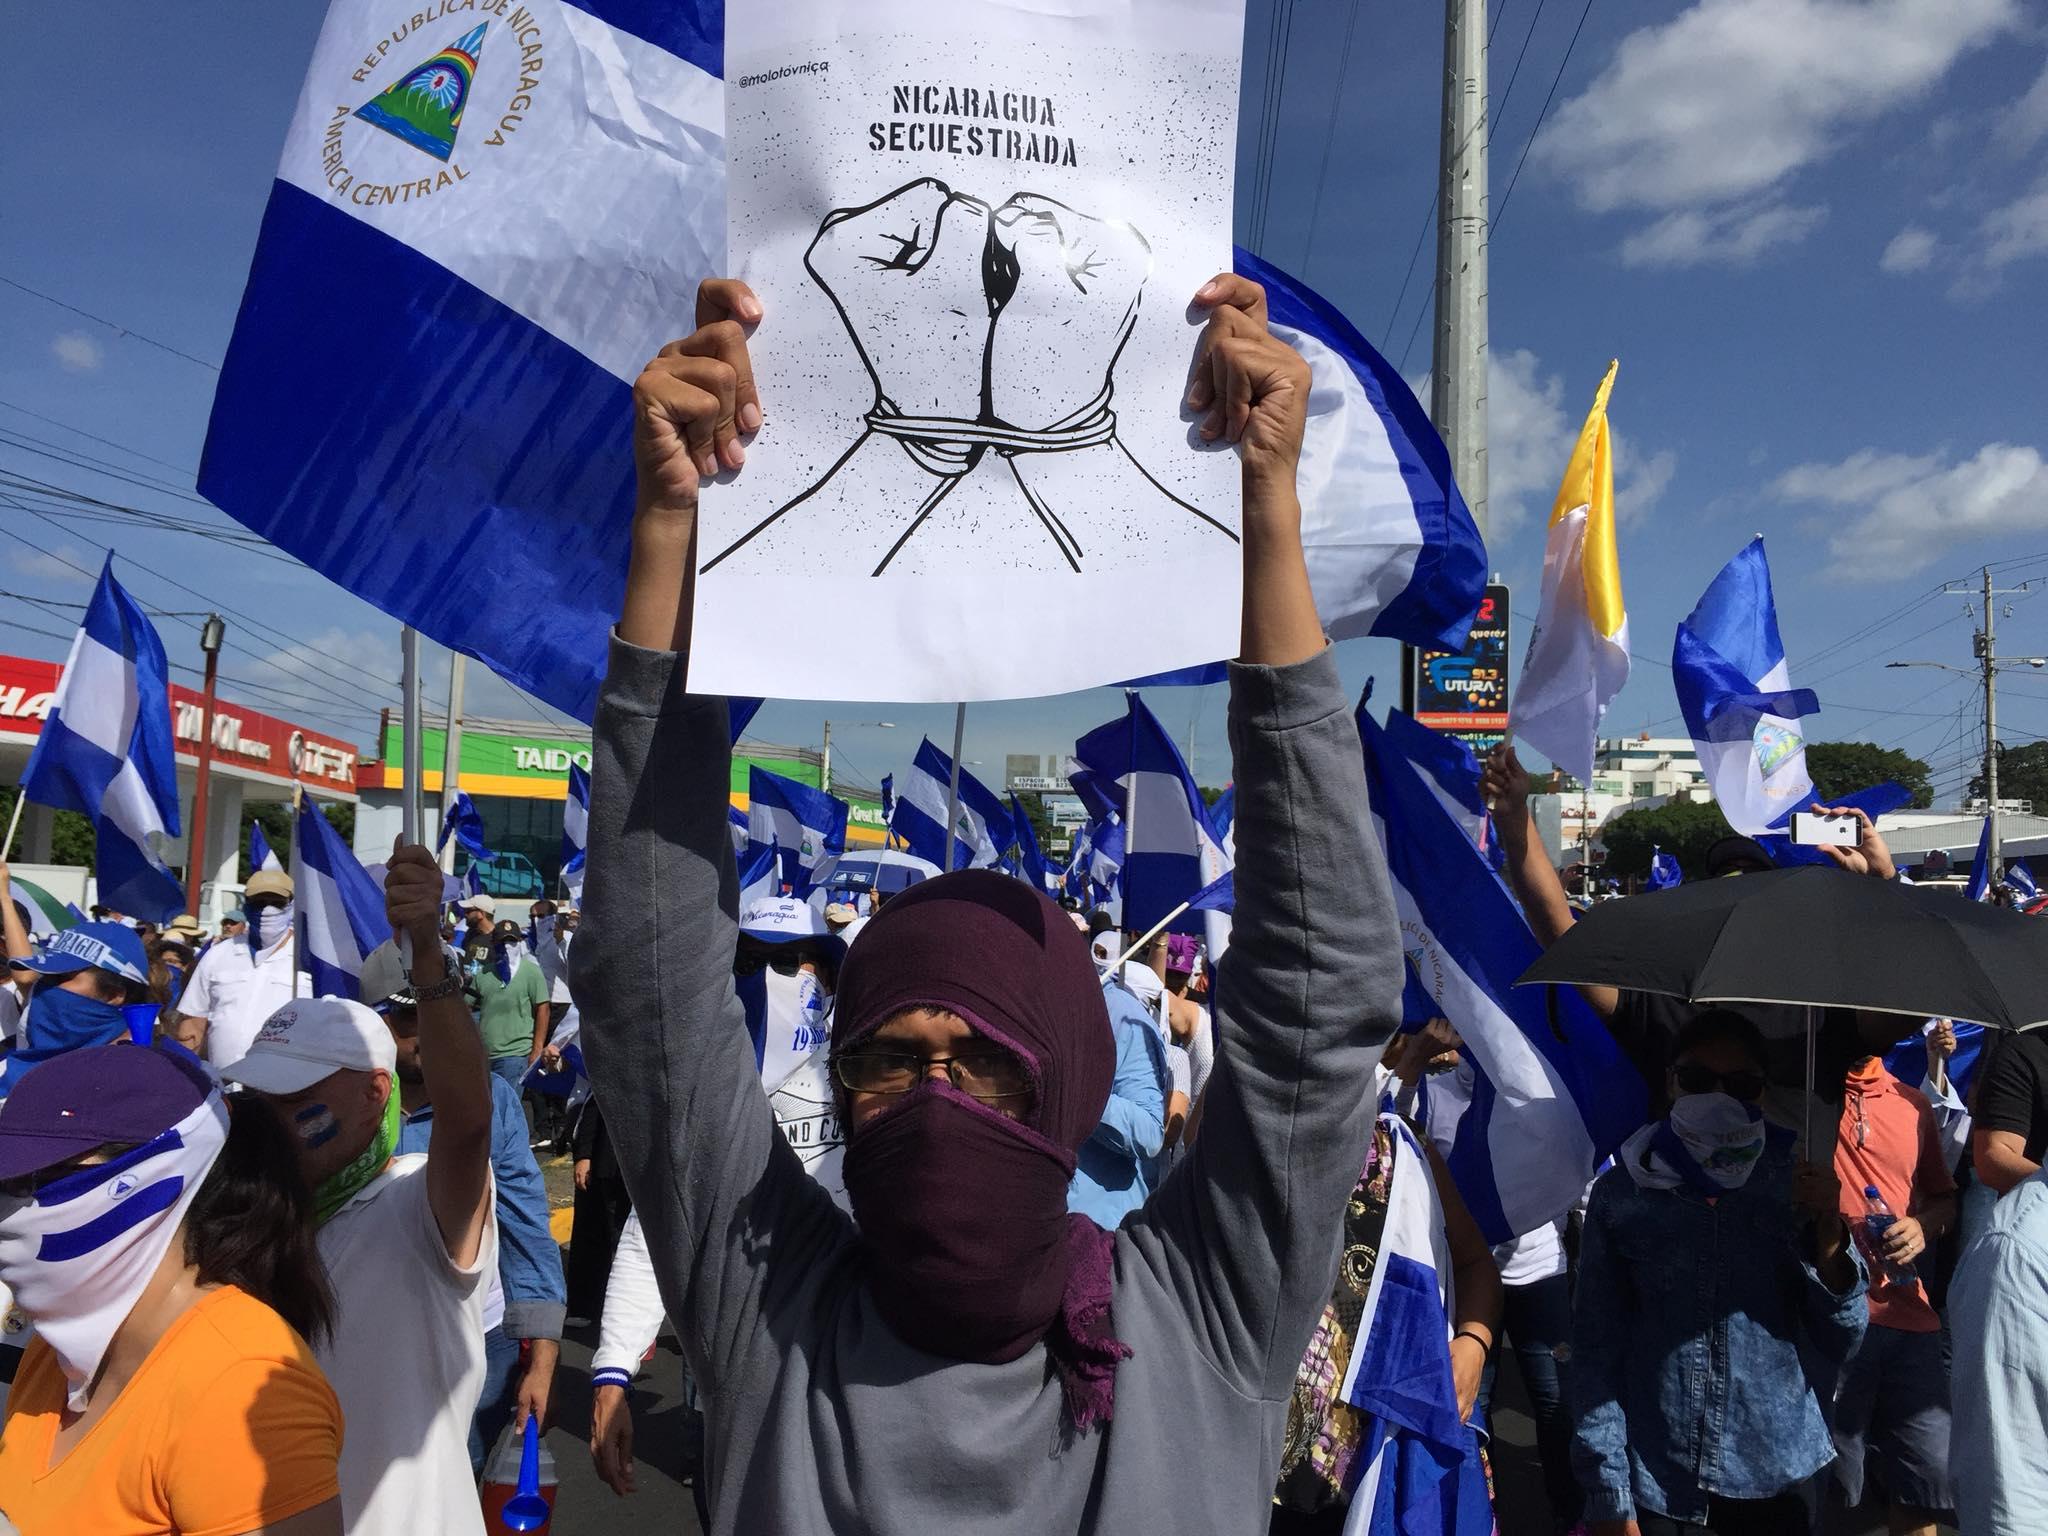 Periodista de Nicaragua denuncia amenazas de muerte